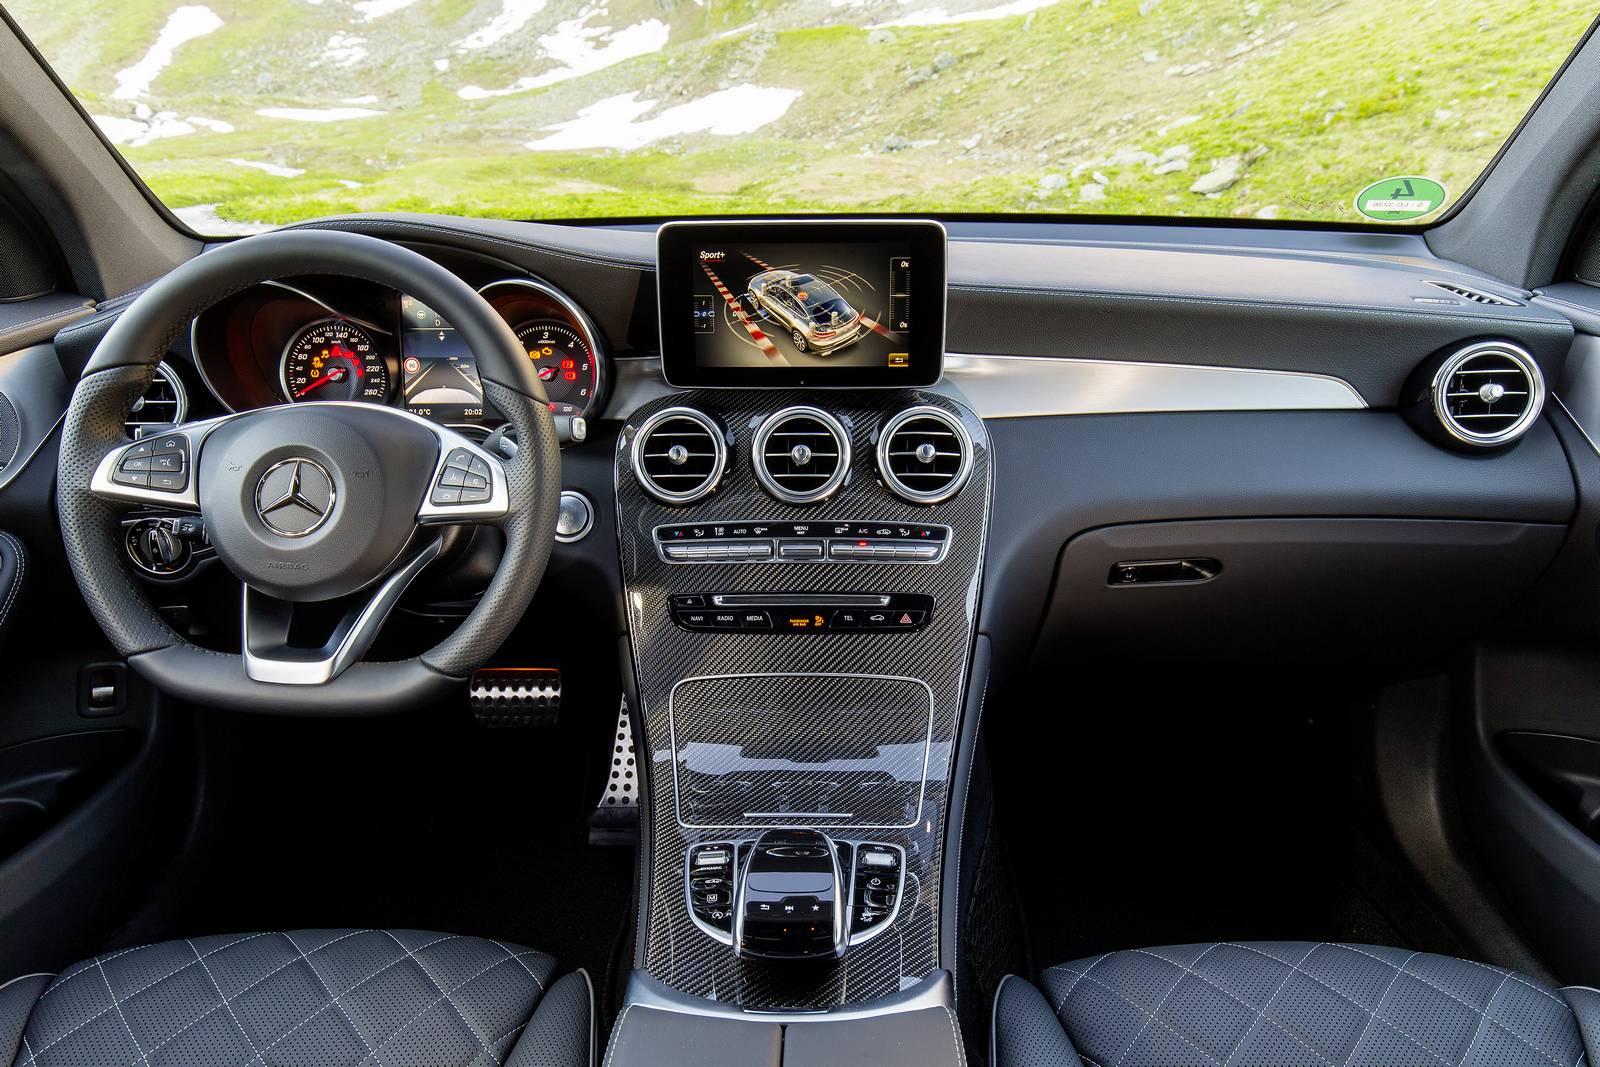 http://gtspirit.com/wp-content/uploads/2016/06/Hyacinth-Red-Mercedes-Benz-GLC-350d-Coupe-3.jpg